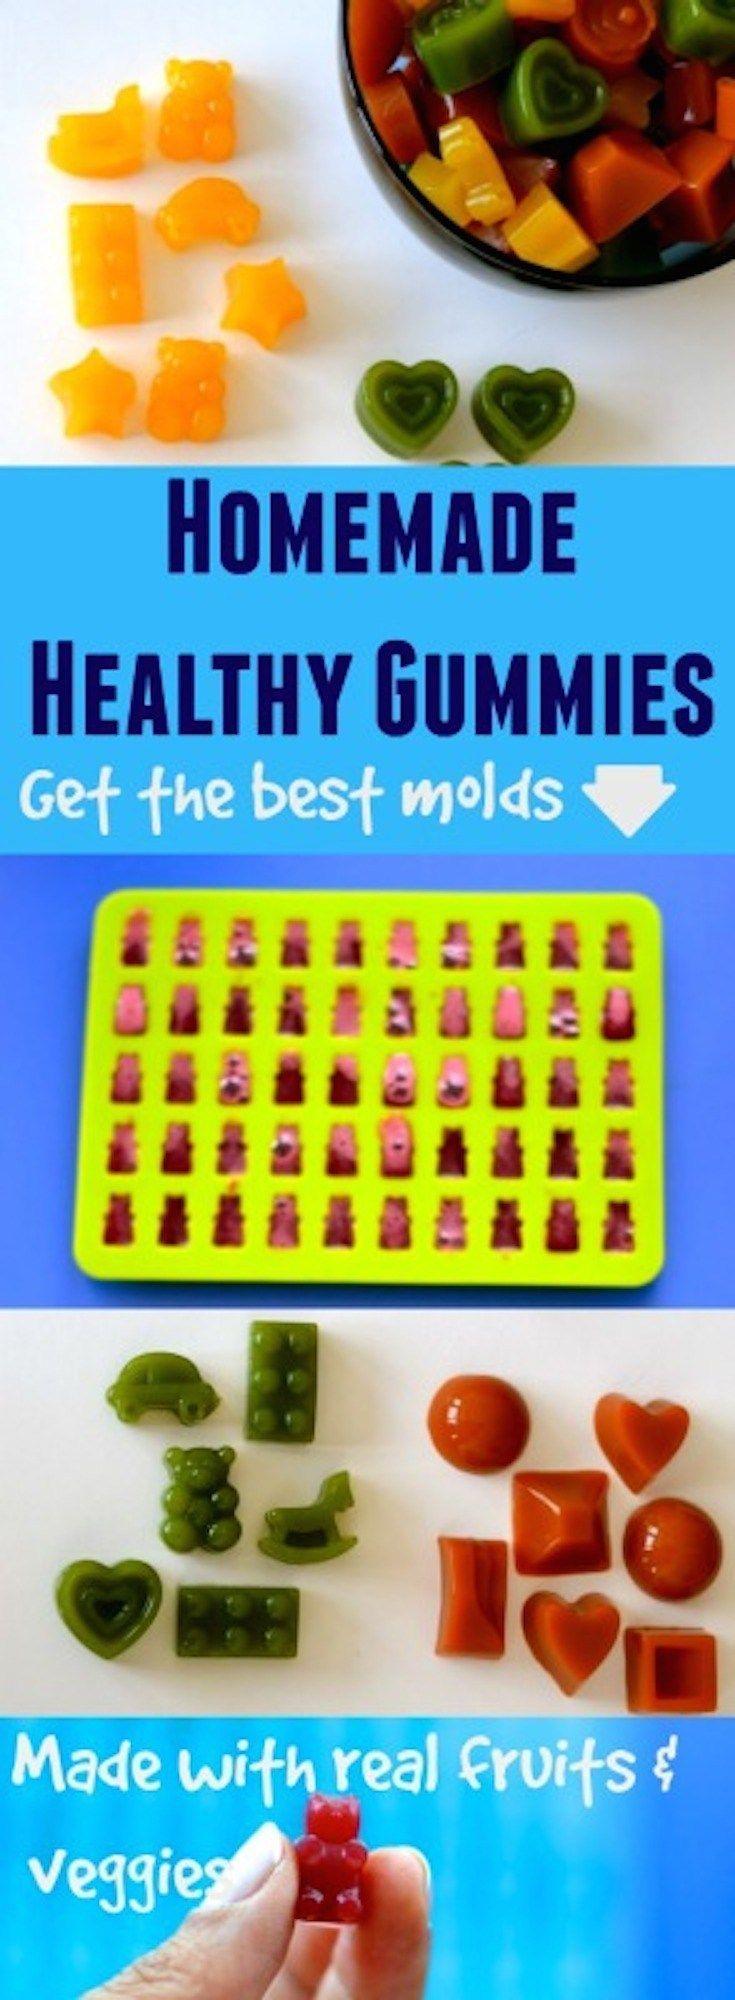 Homemade Healthy Gummies